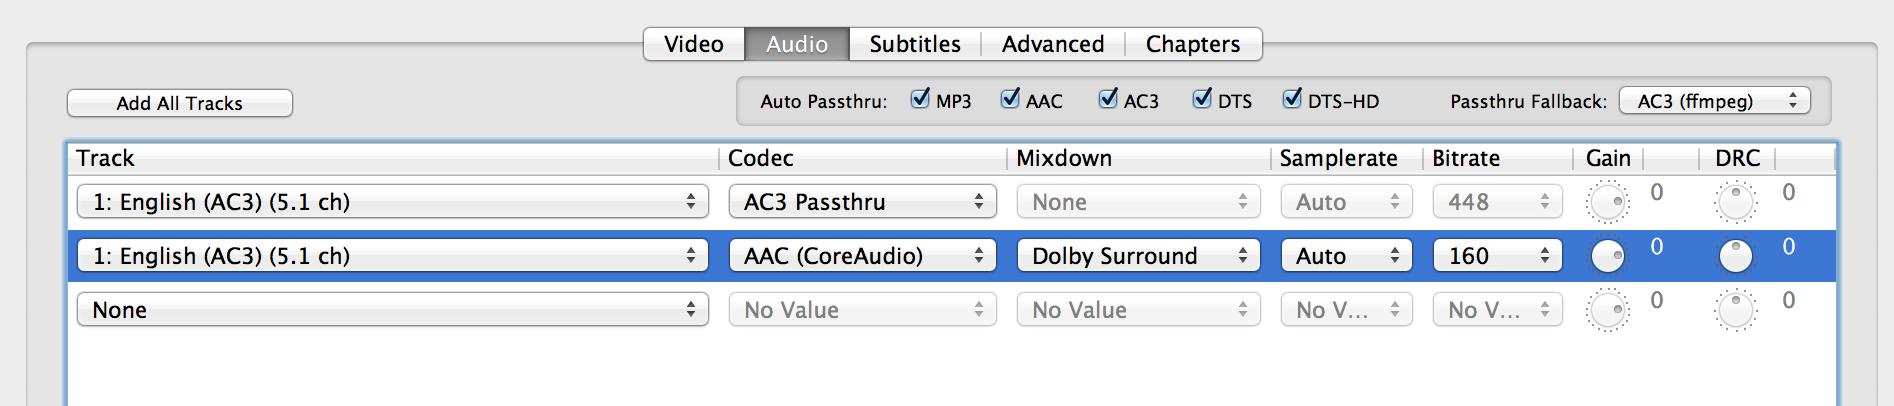 Tweaking4All com - MacOS X - HandBrake - Copy a DVD to MP4